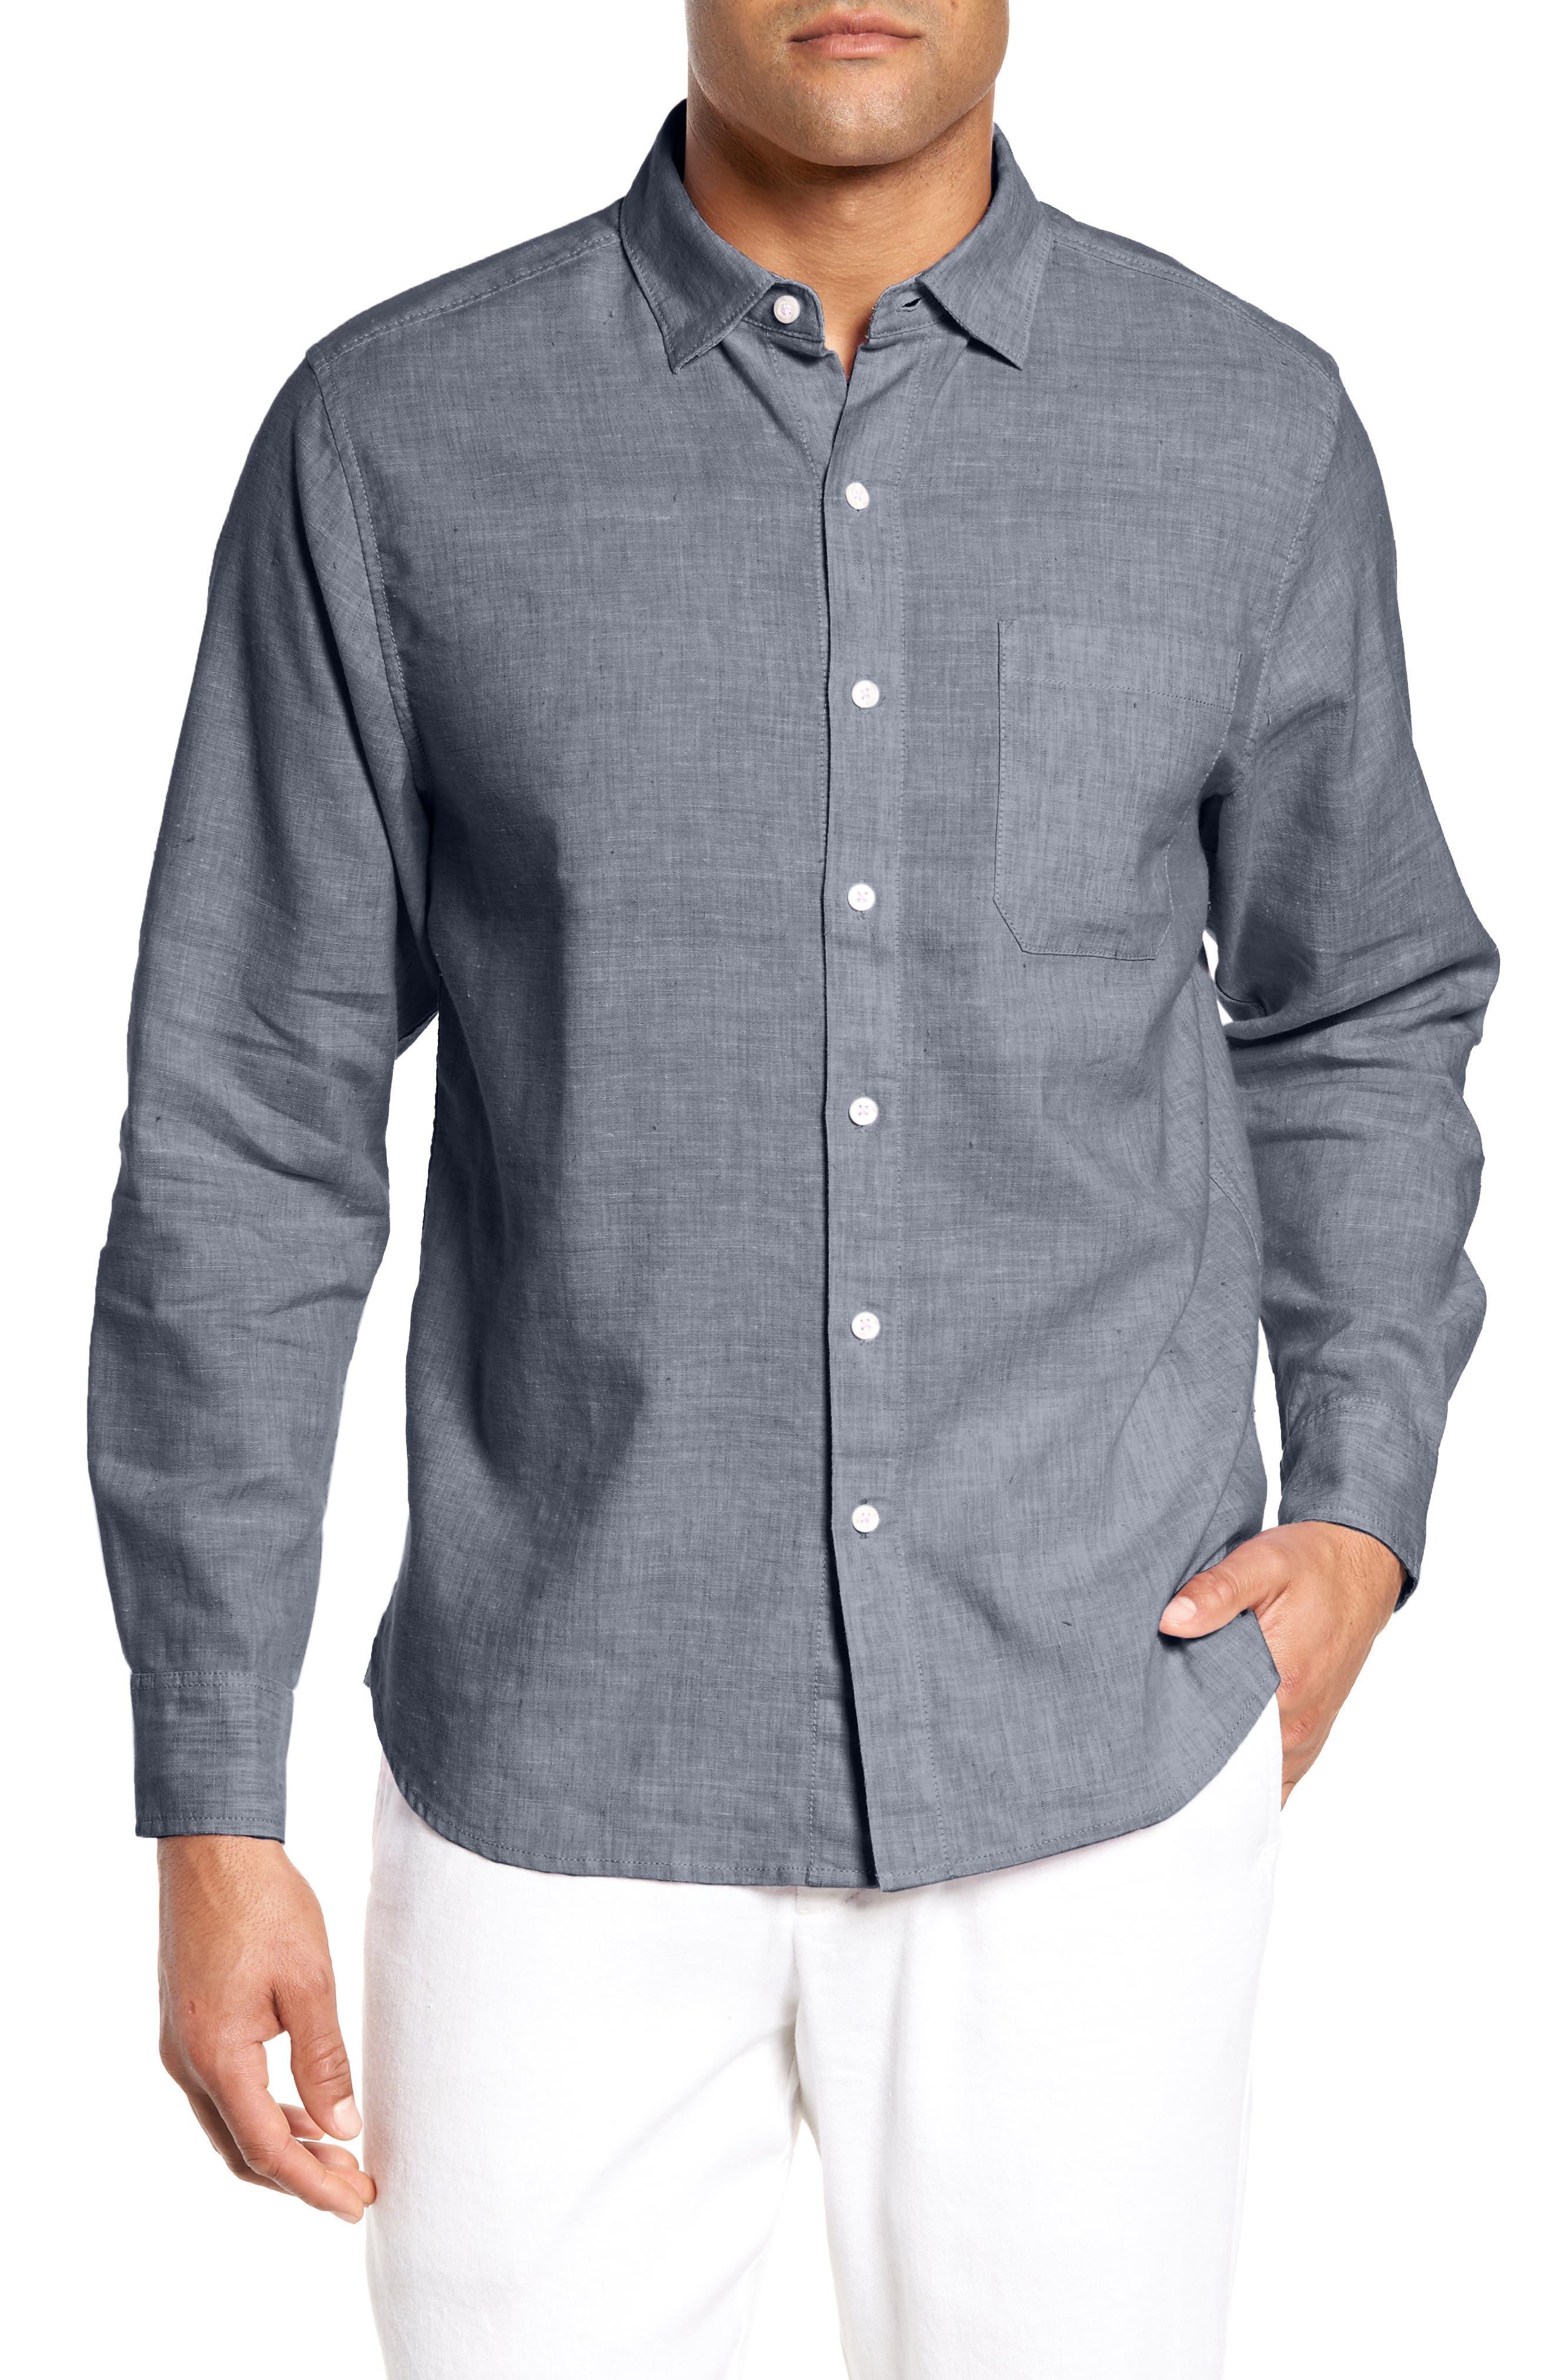 Lanai Tides Regular Fit Linen Blend Sport Shirt,                         Main,                         color, Throne Blue